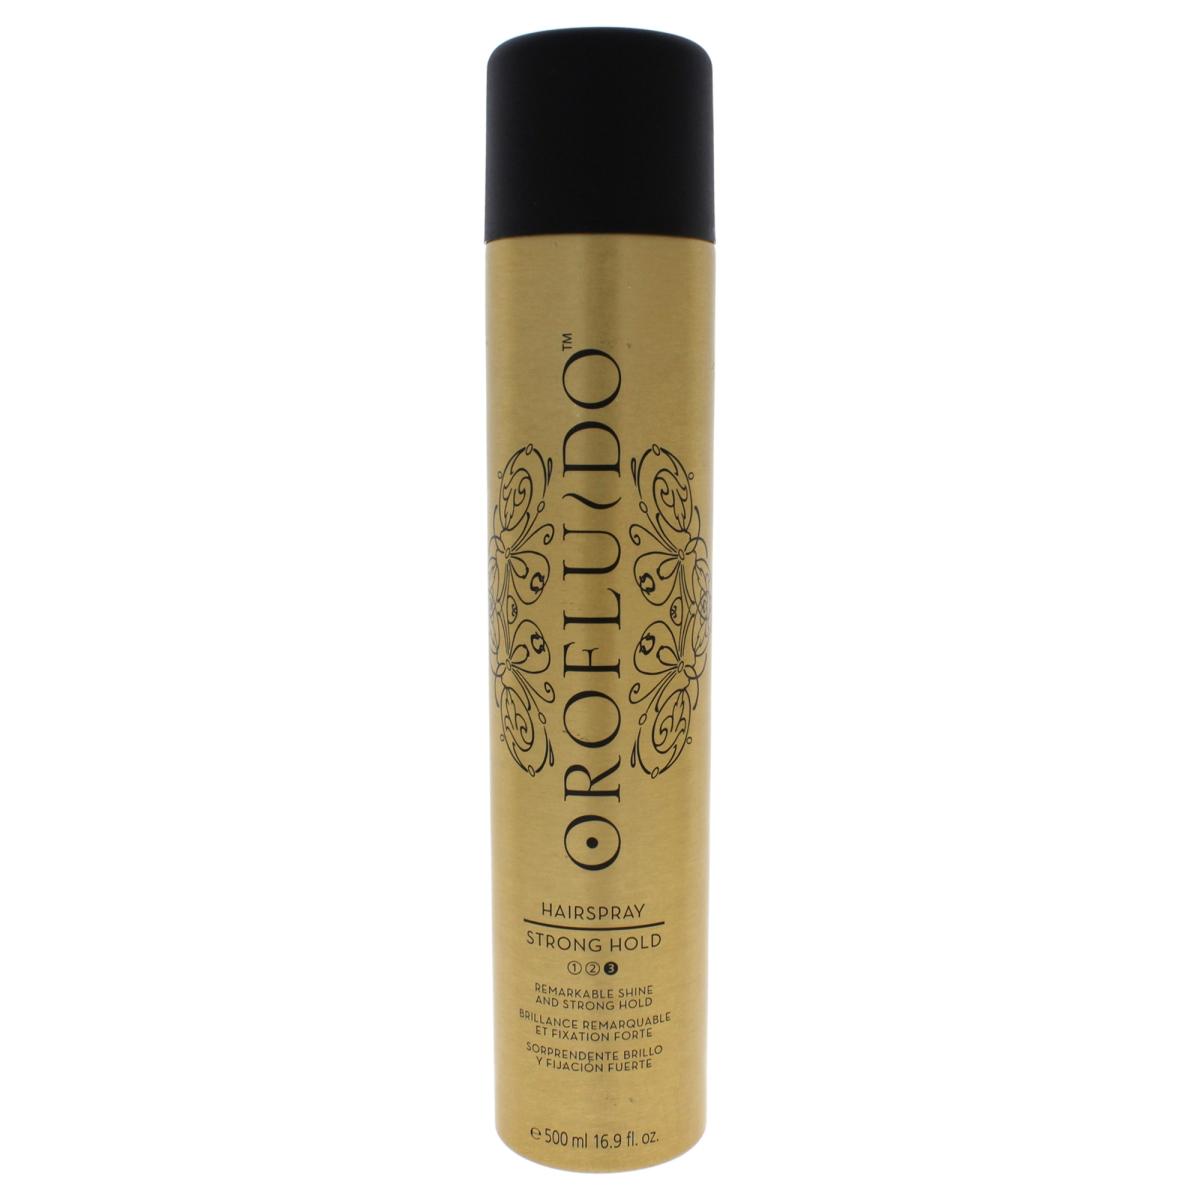 Orofluido U-HC-11964 16.9 oz Hairspray Strong for Unisex